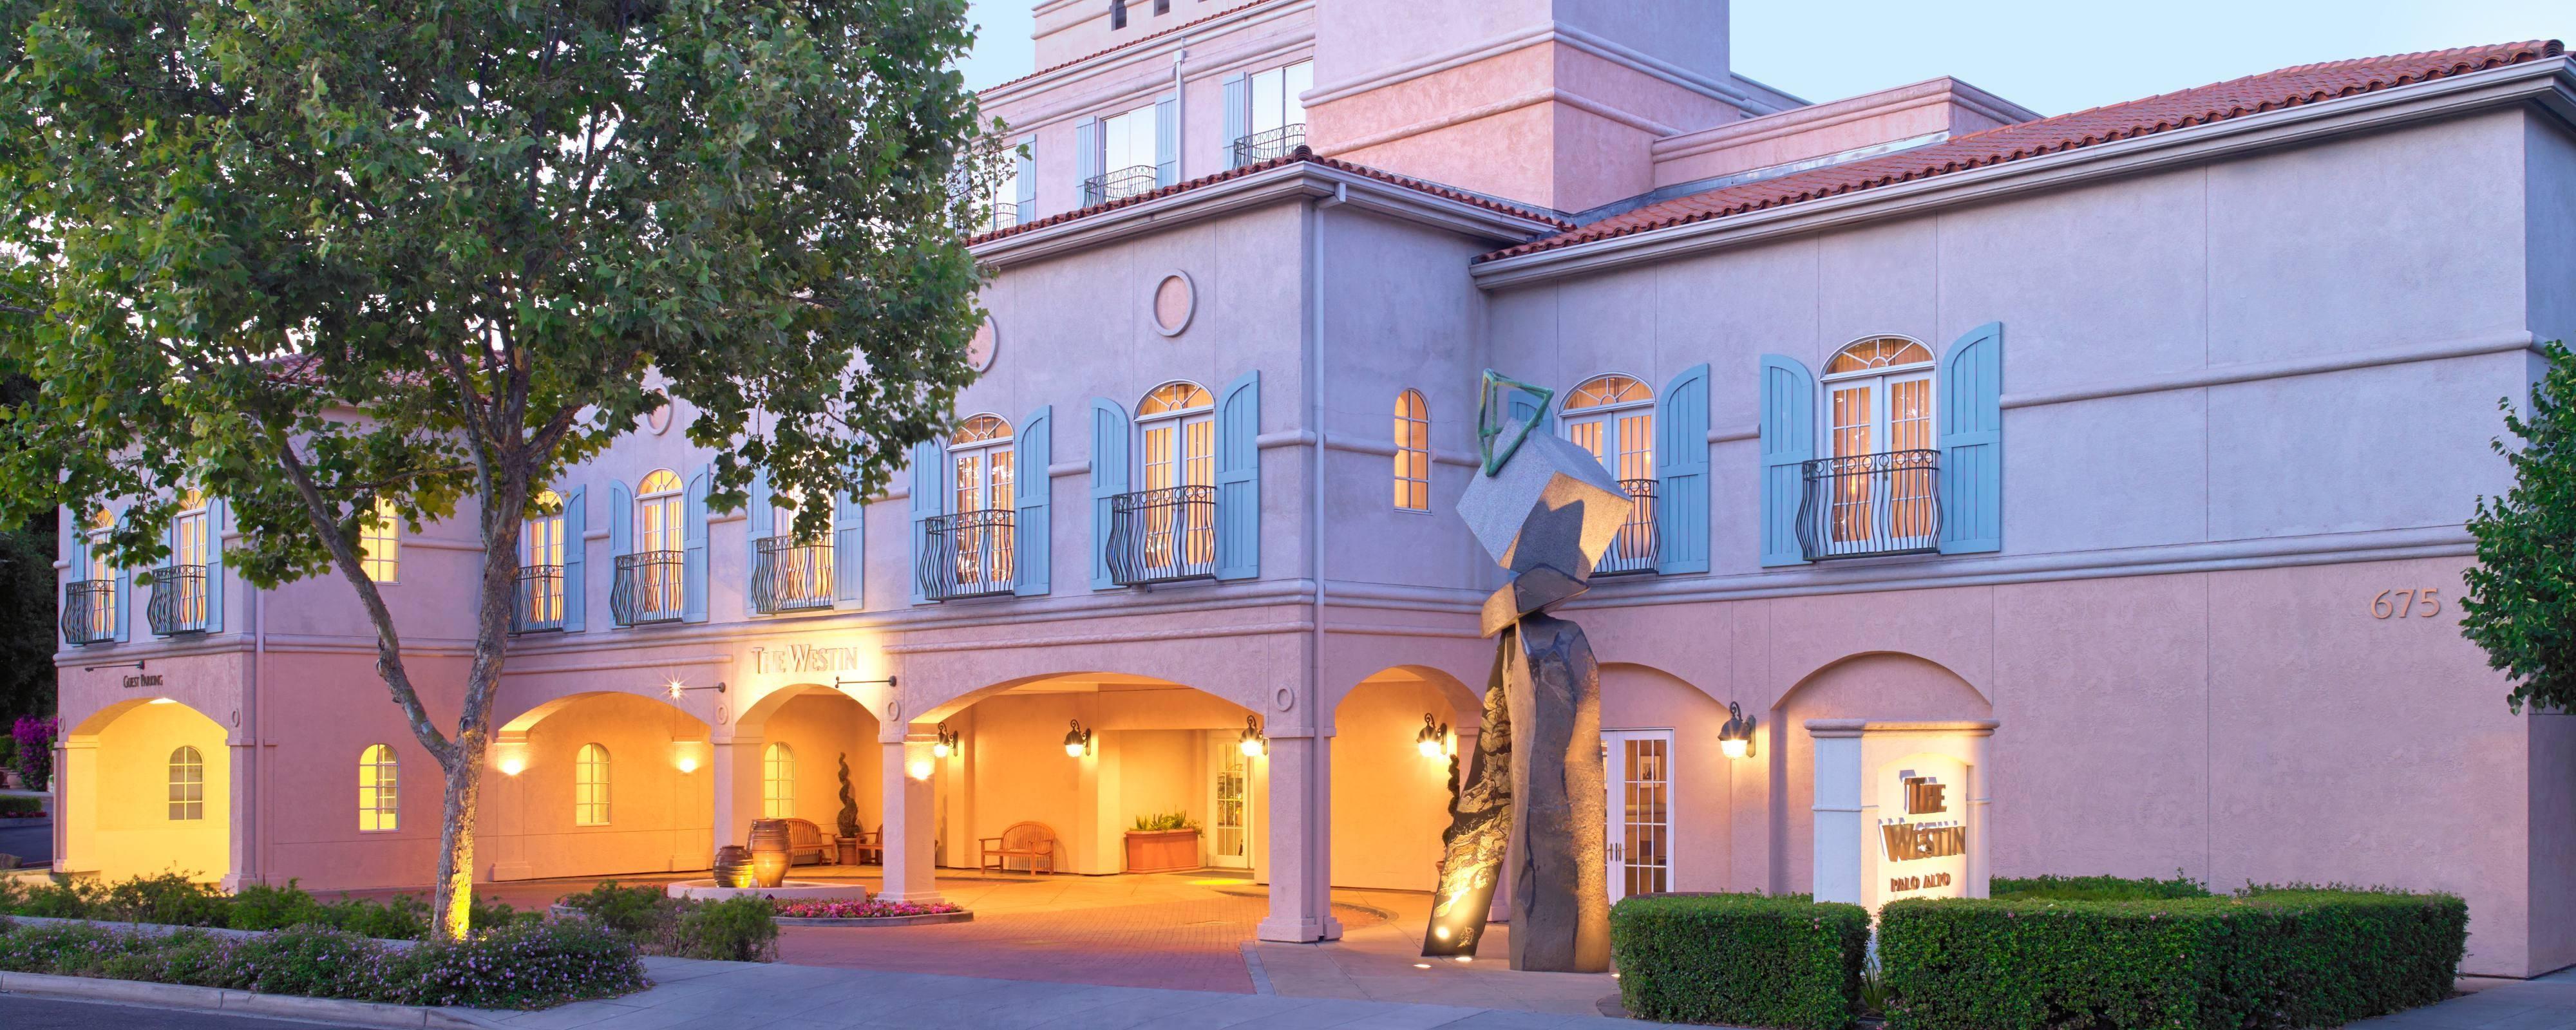 Westin Palo Alto Exterior